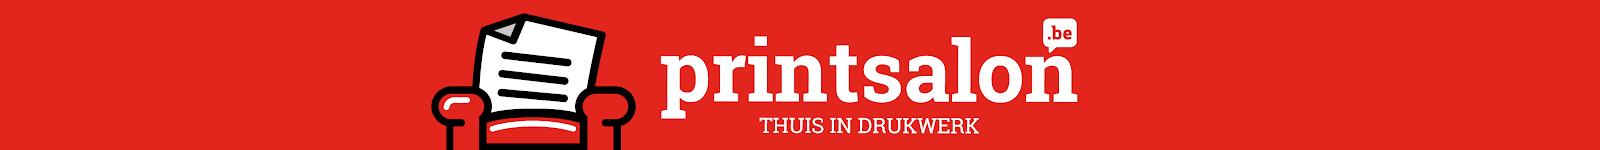 Printsalon bvba | digitaal drukwerk